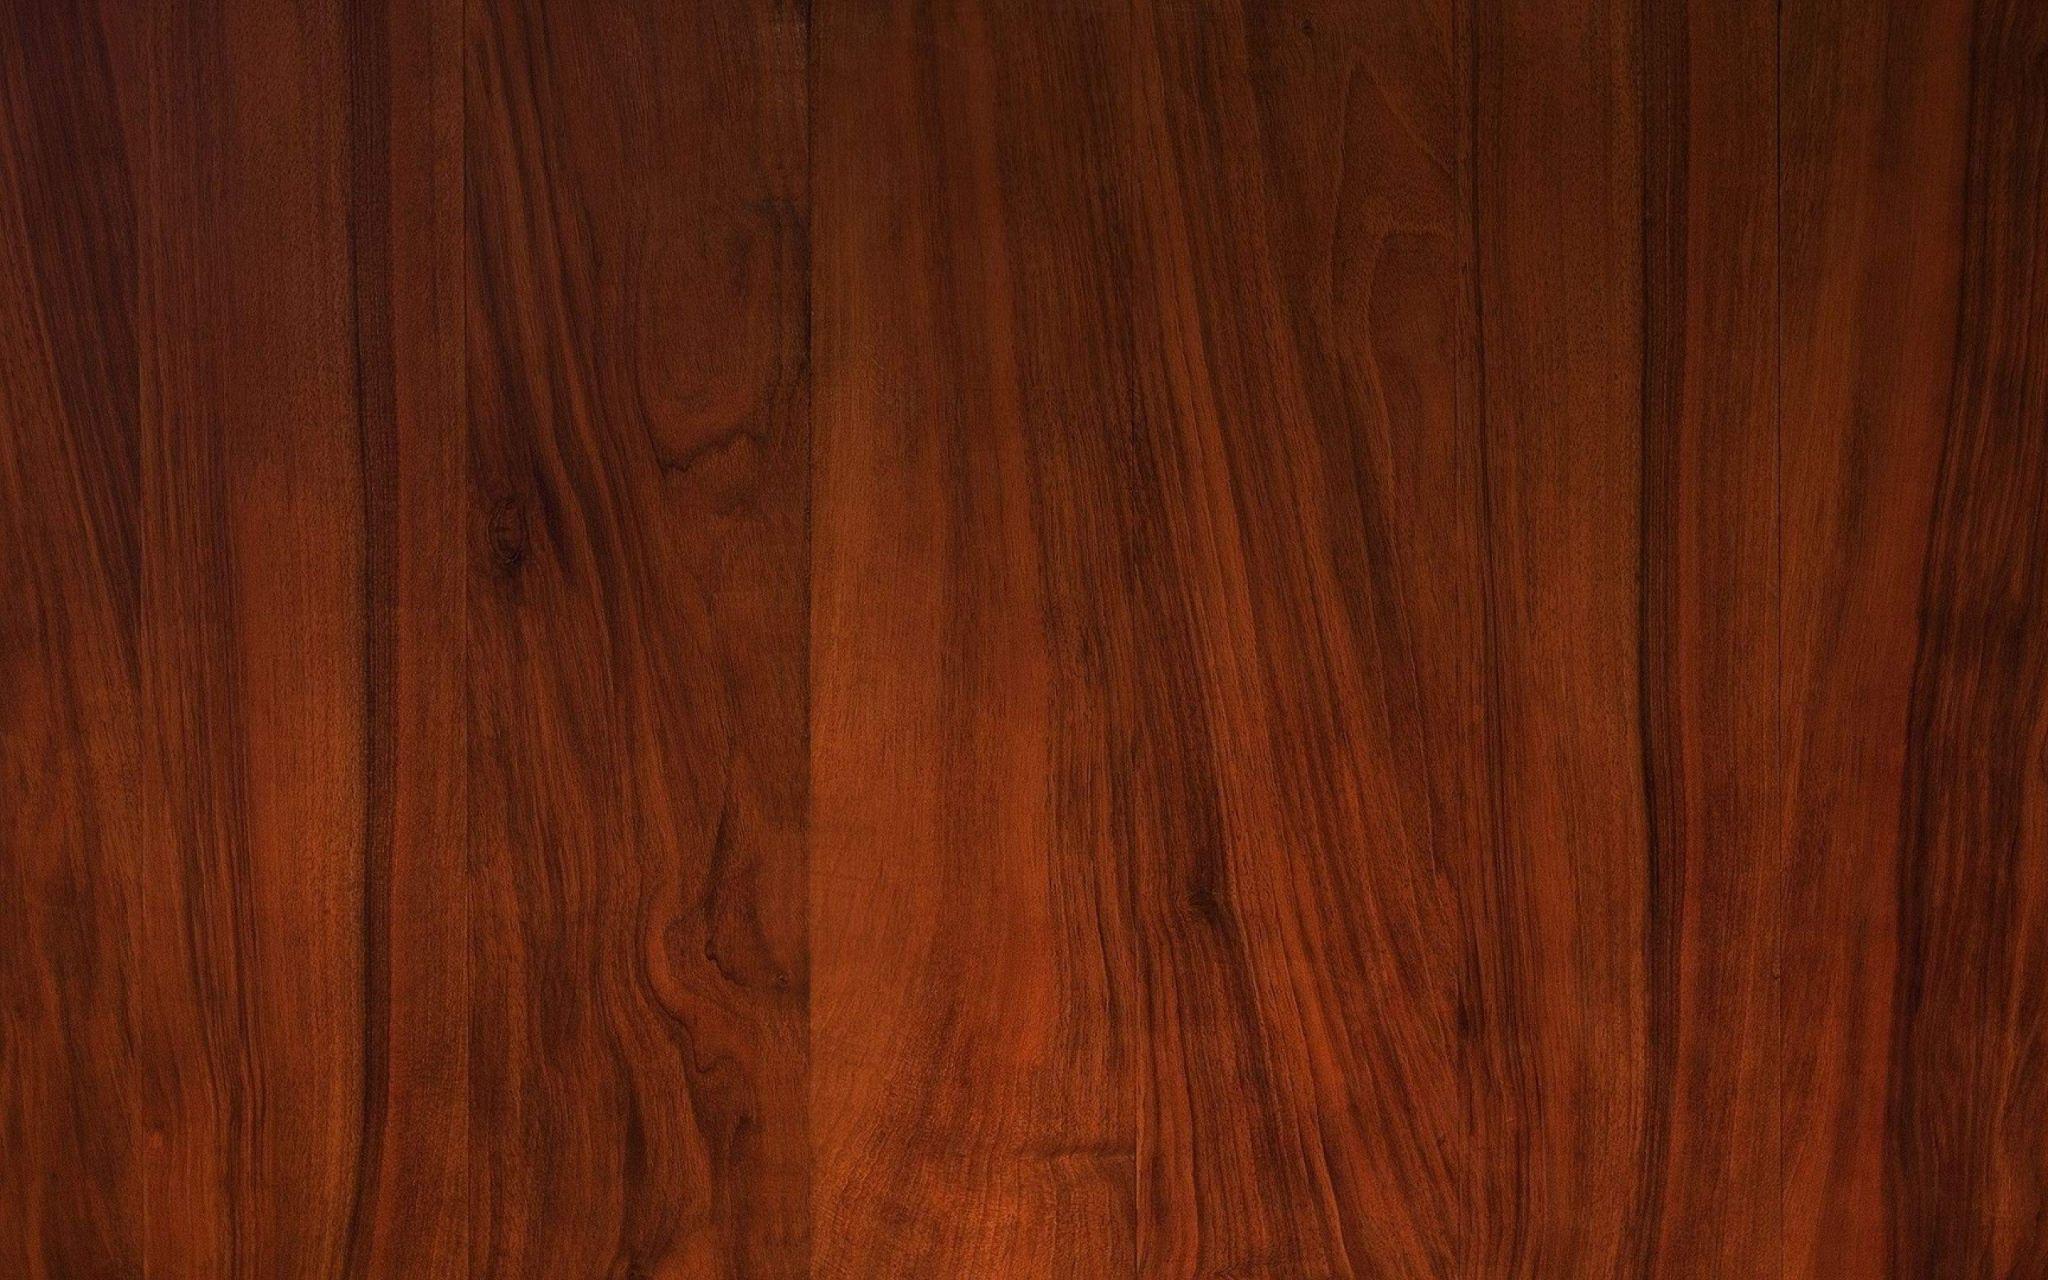 wood background hd | ololoshenka | Pinterest | Wood ...